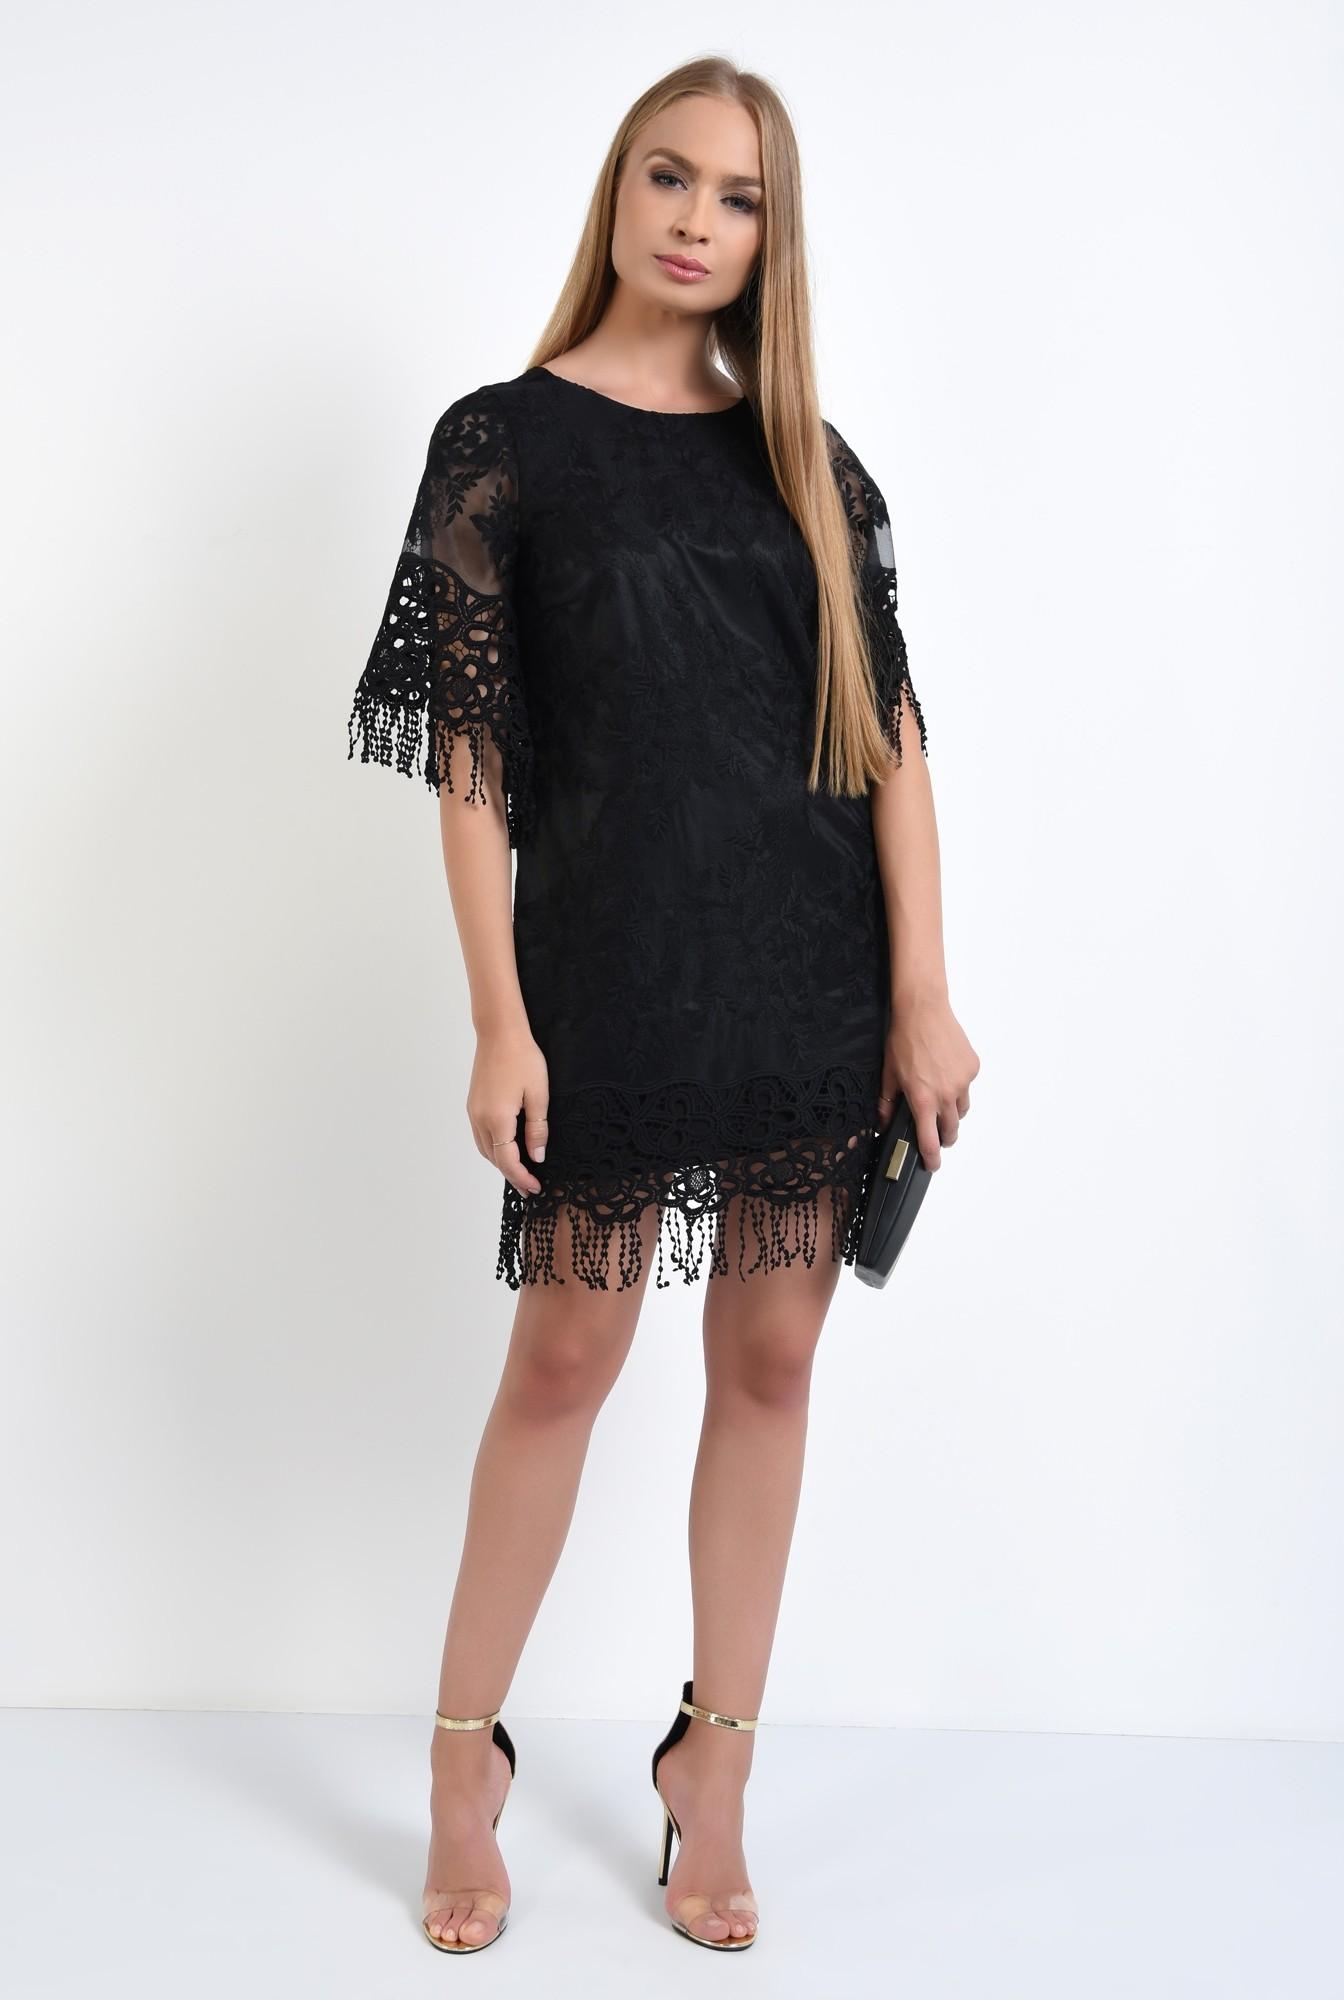 0 - rochie eleganta, dantela brodata, franjuri, rochii online